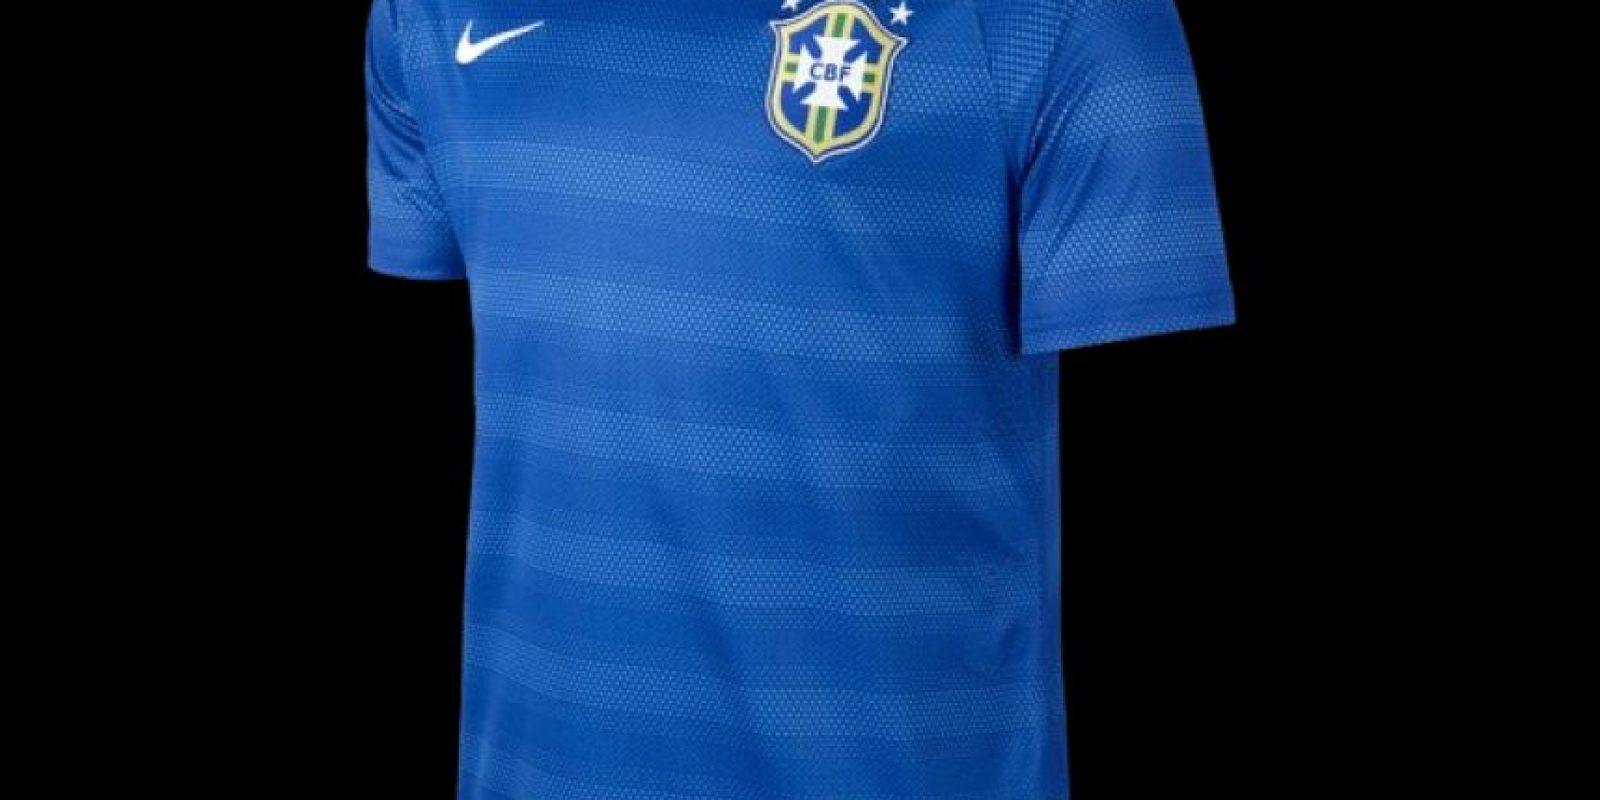 Esta es la camiseta de visitante. Foto:Nike Football